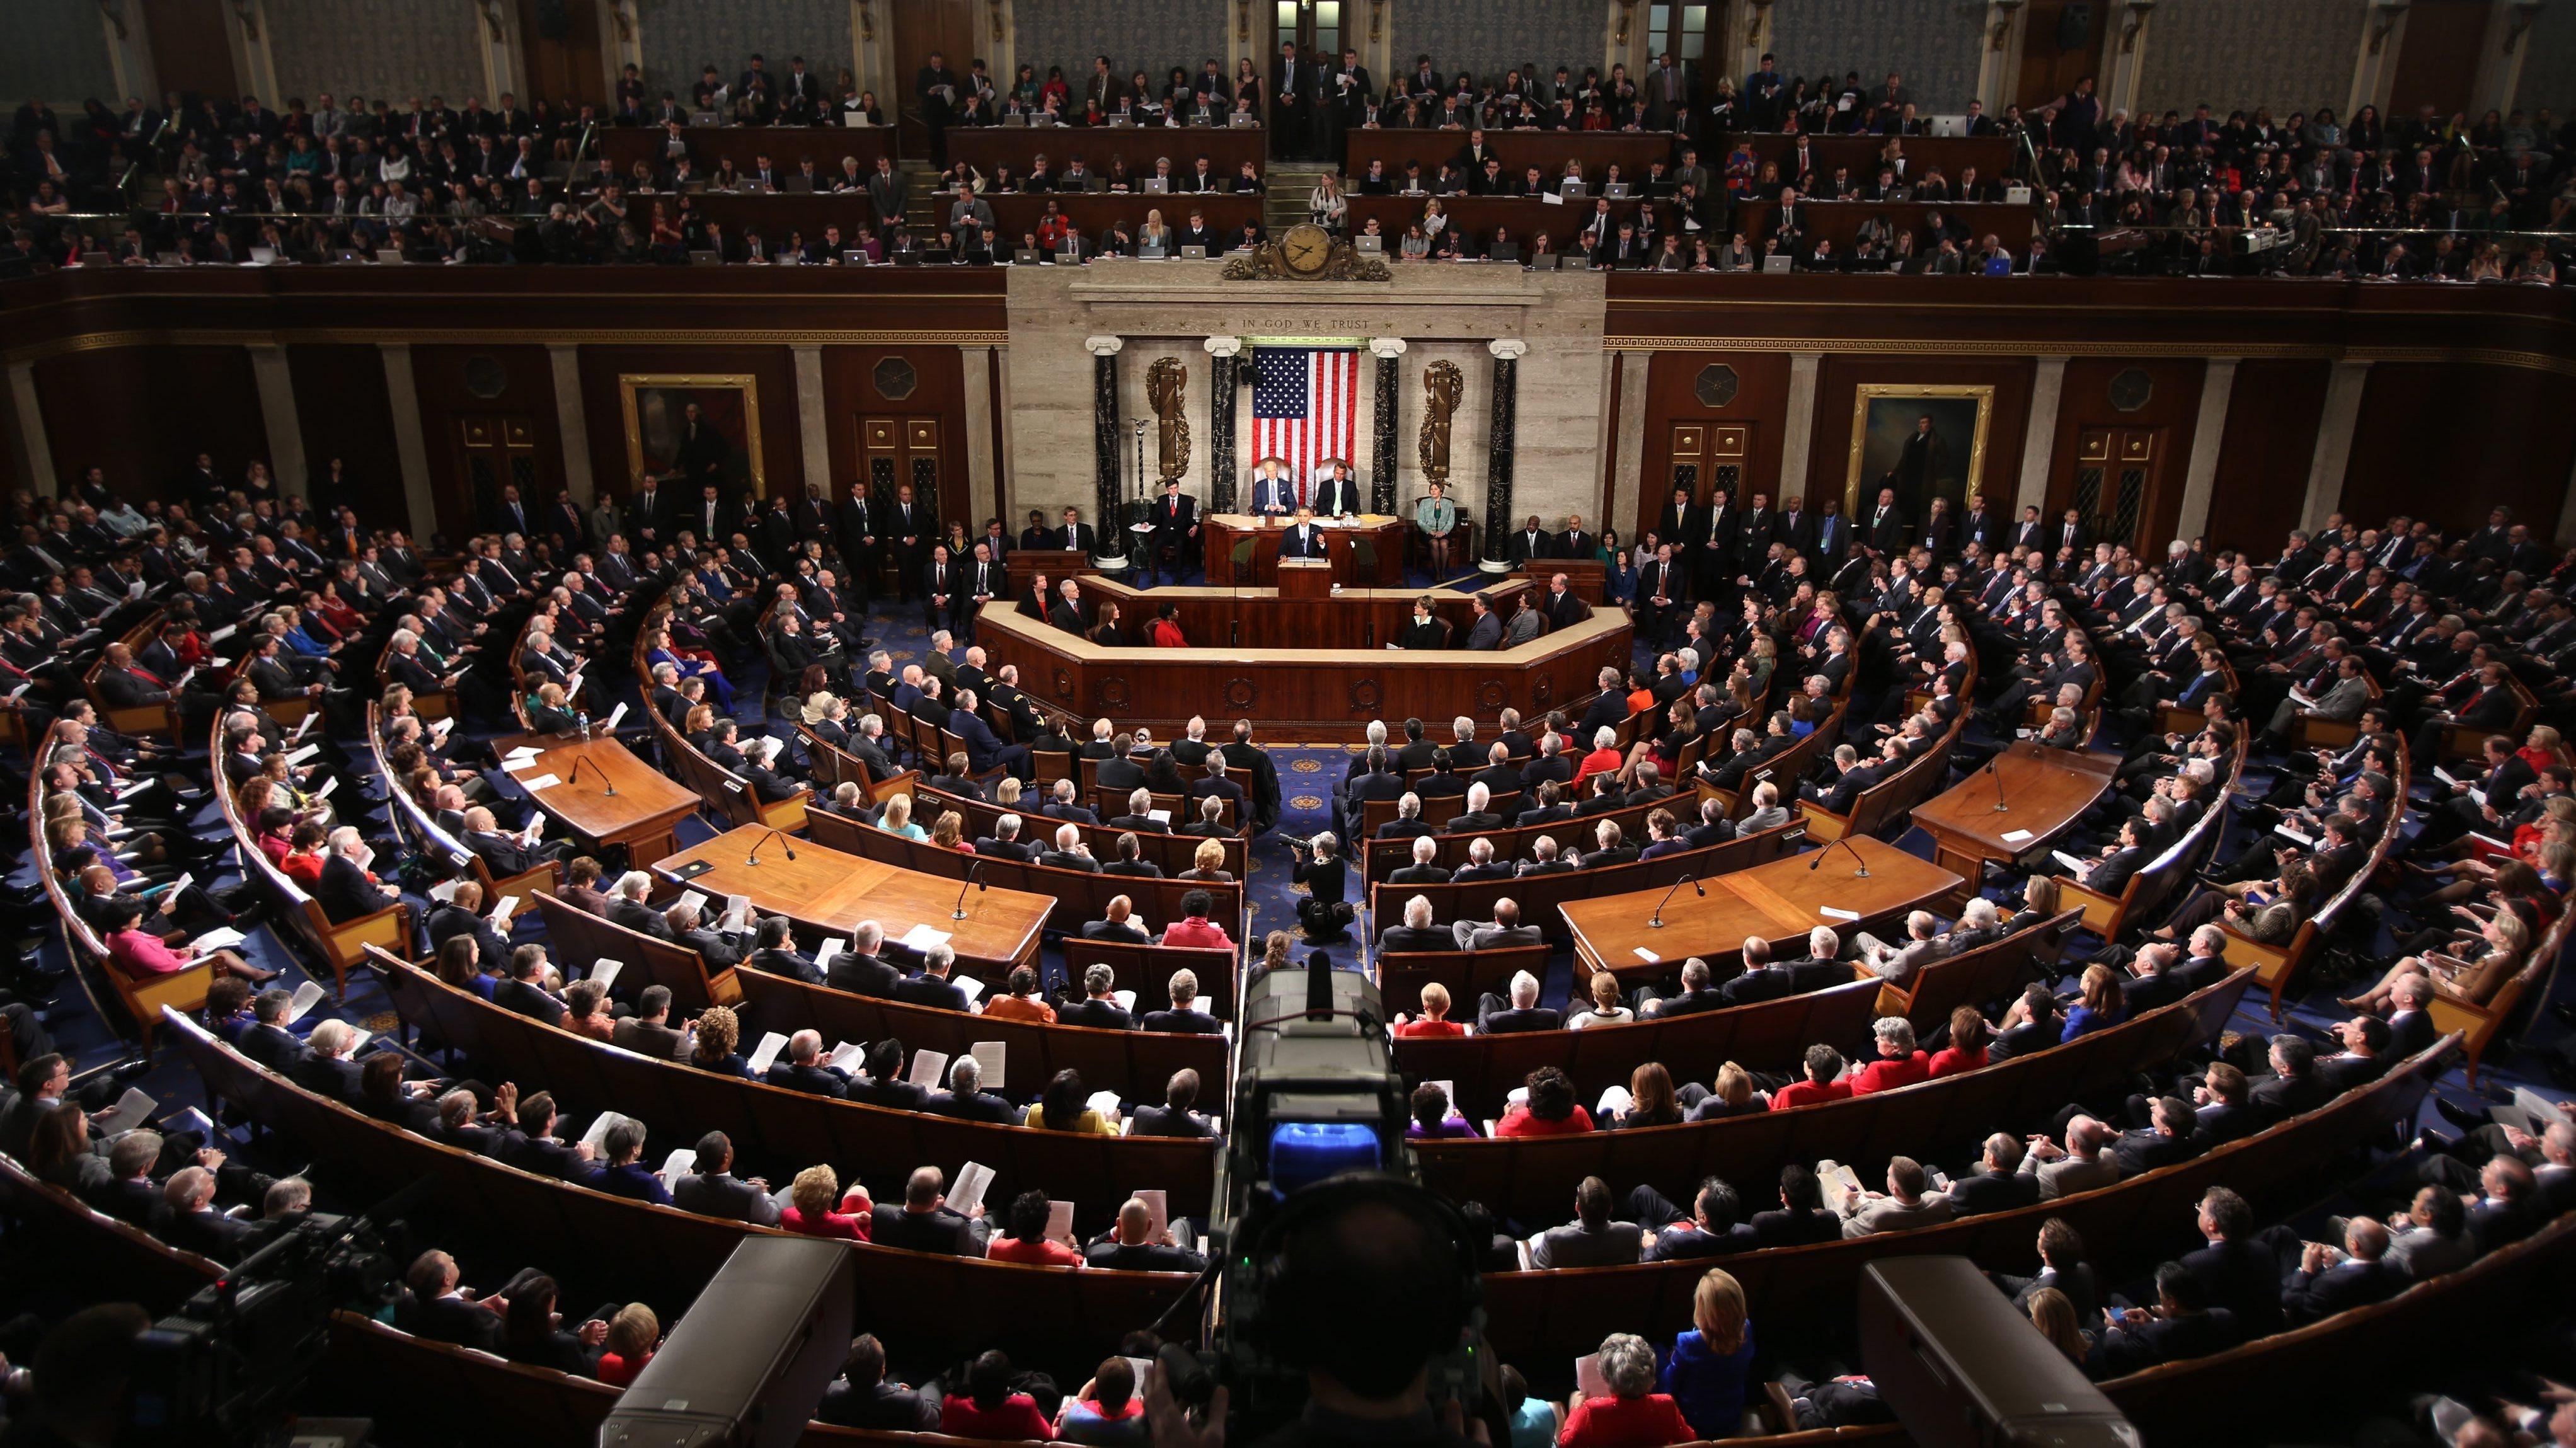 Do We Need A Bigger House Of Representatives? House Of Representatives